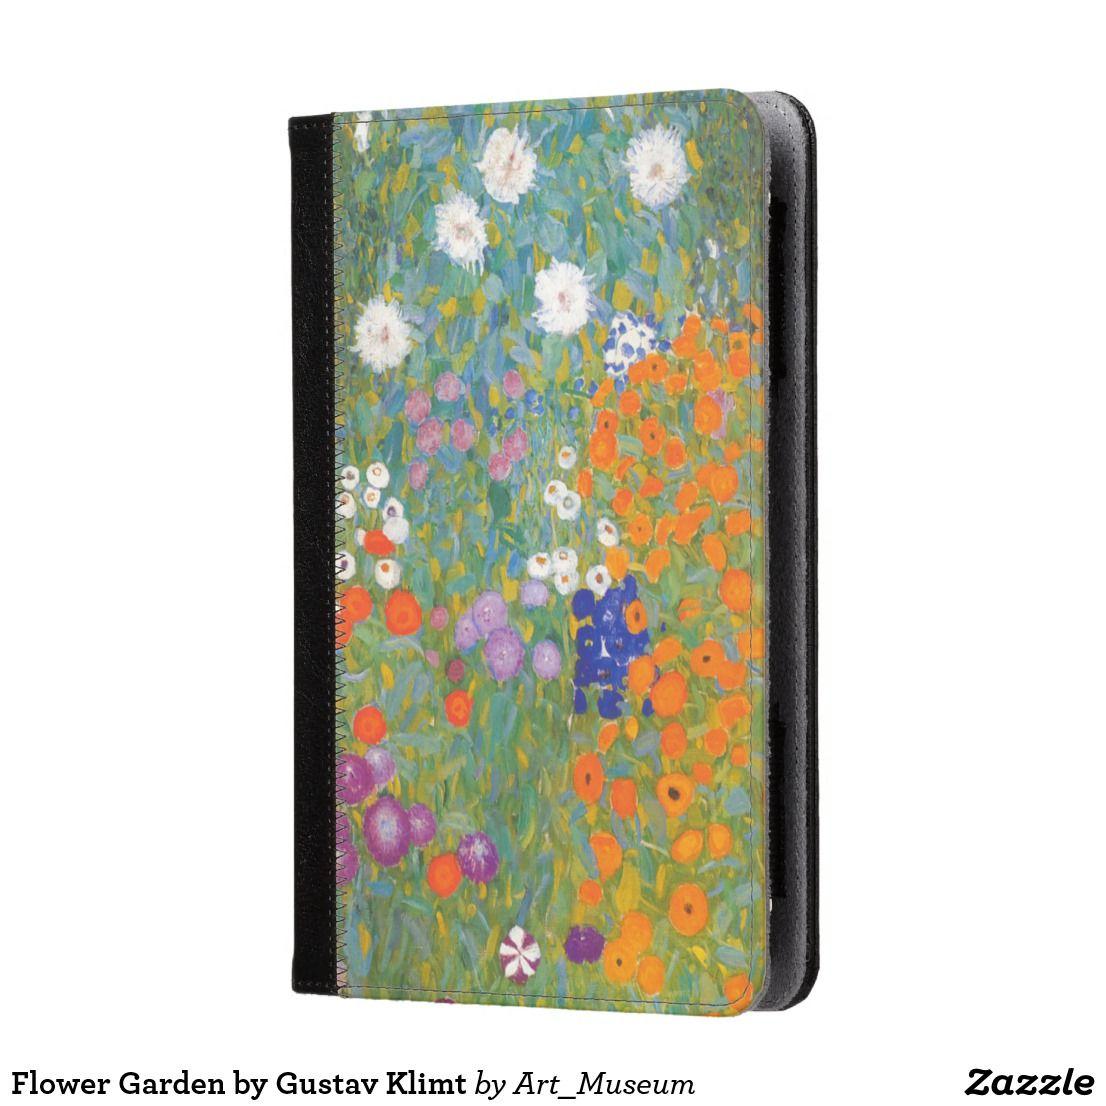 Flower Garden By Gustav Klimt Kindle Case Zazzle Com Gustav Klimt Klimt Kindle Case